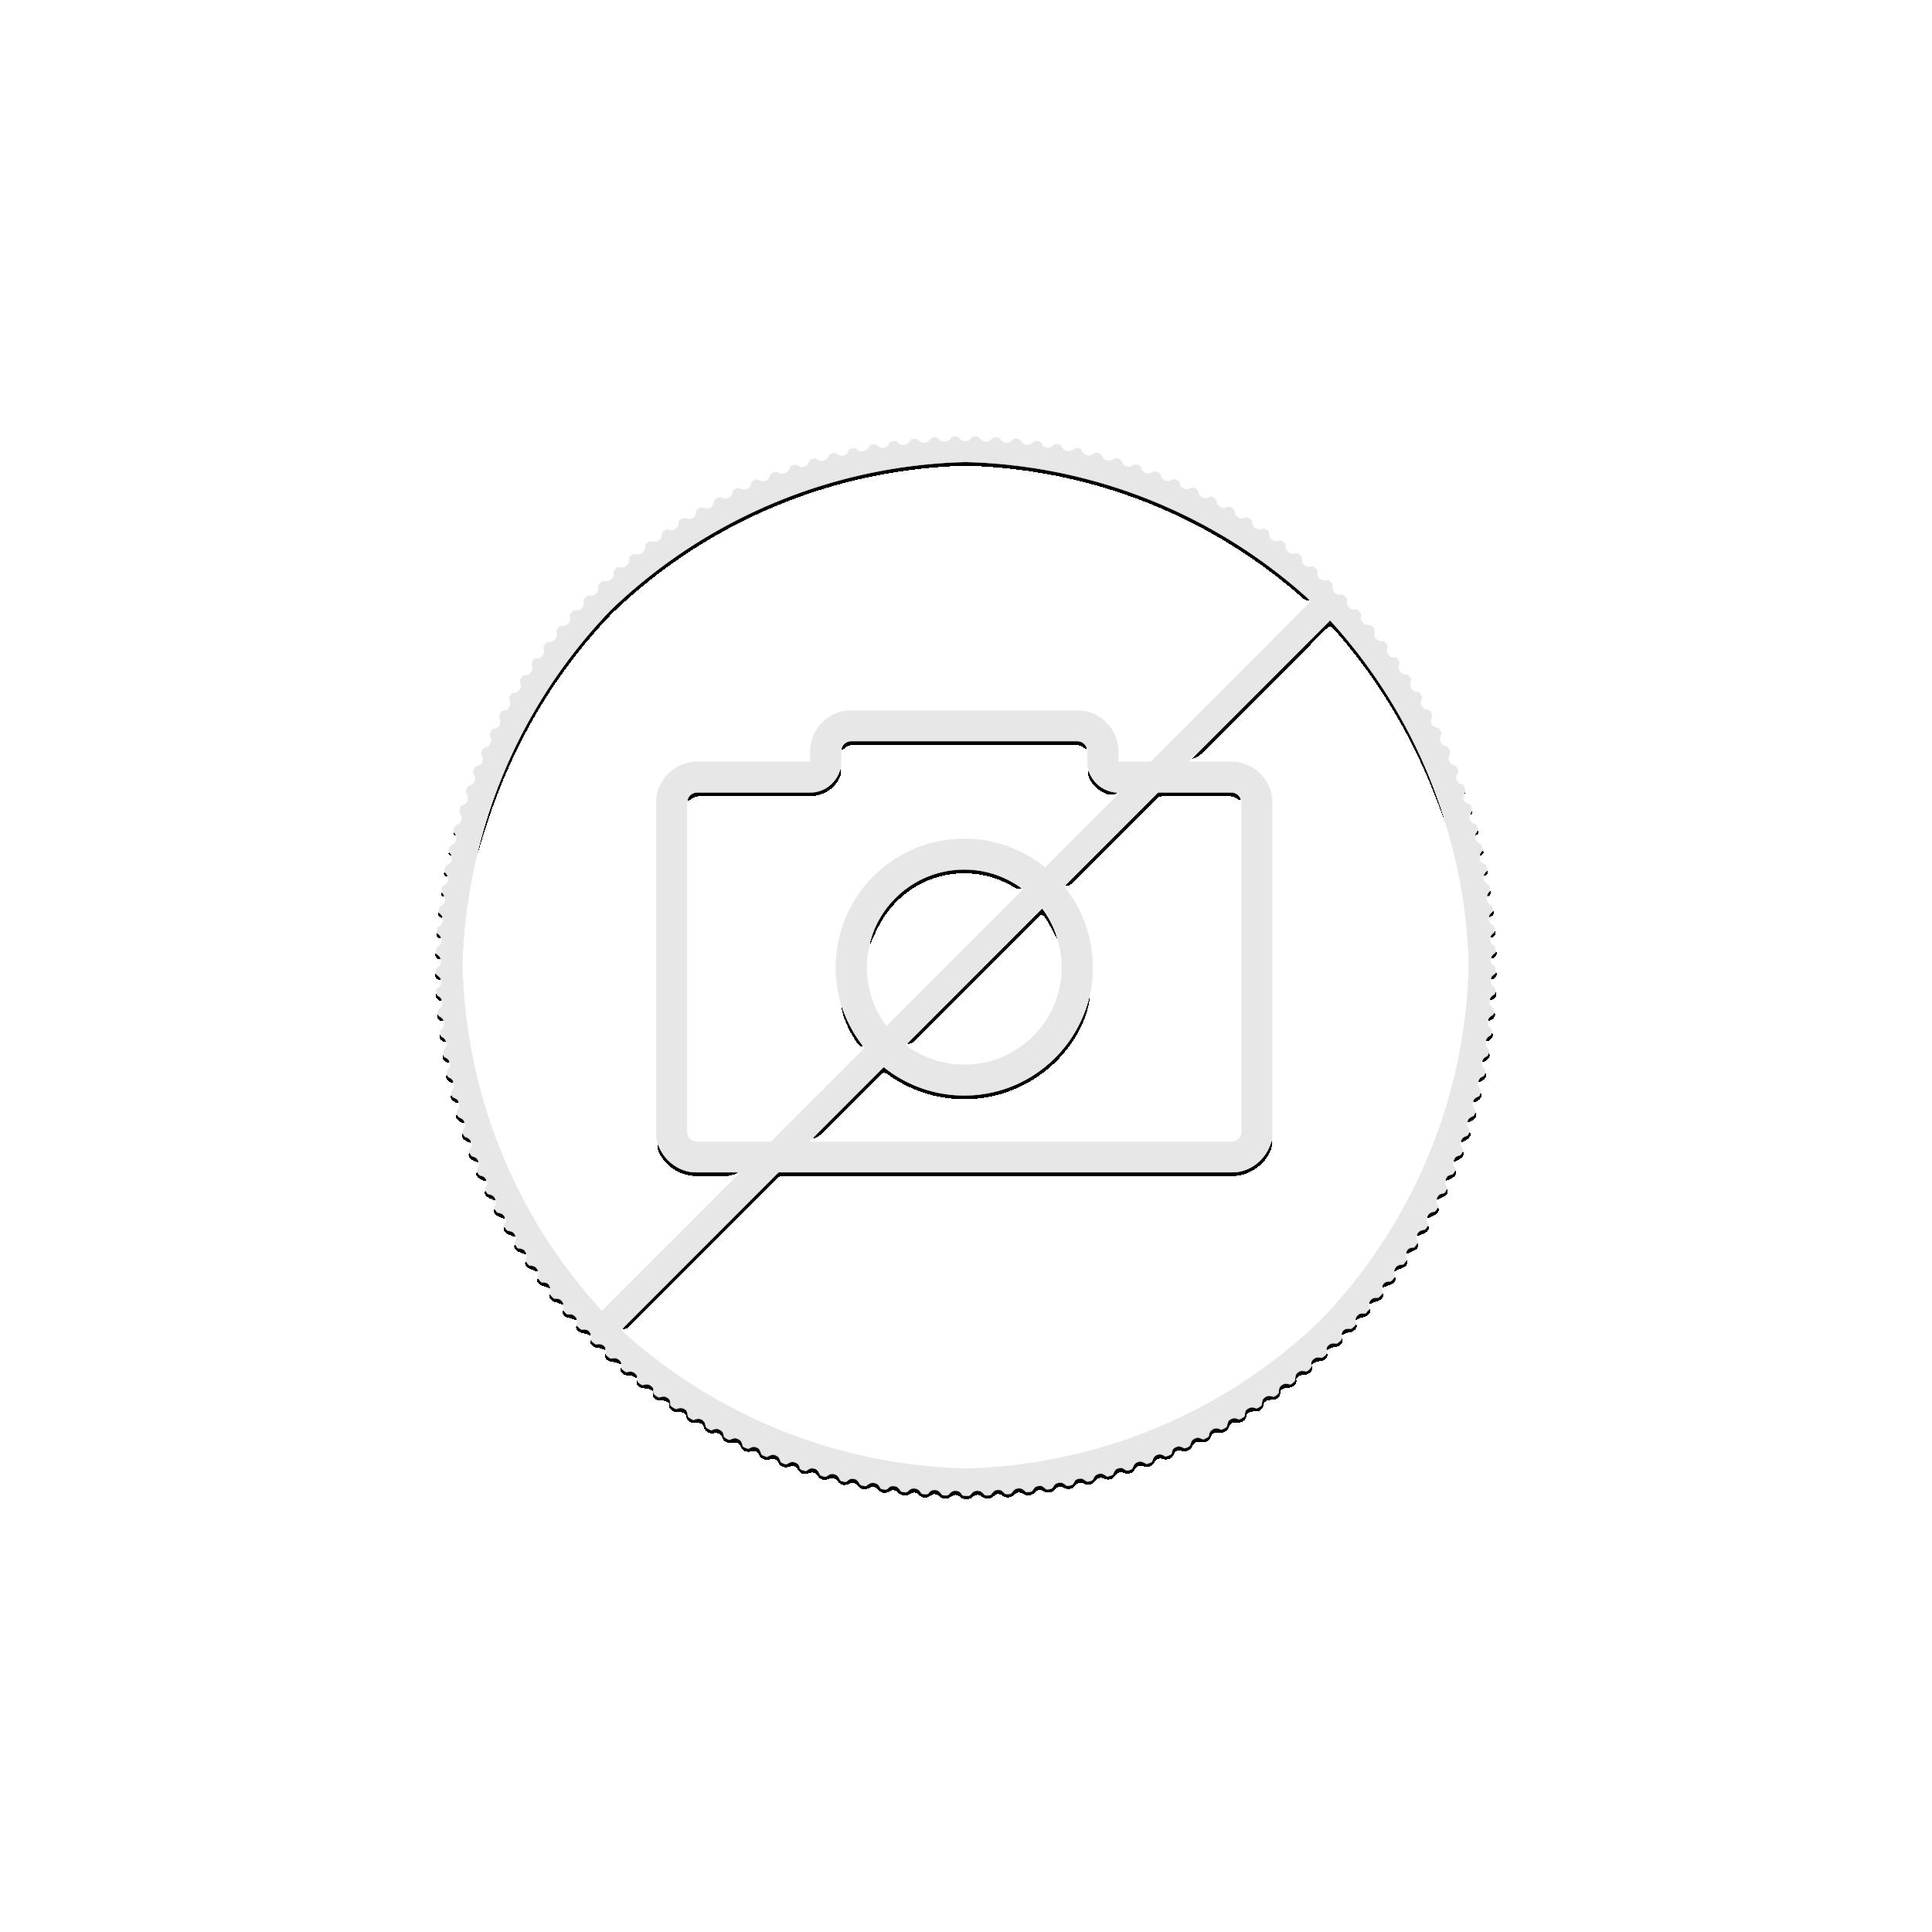 1 Troy ounce zilveren munt American Eagle Rising Phoenix 2020